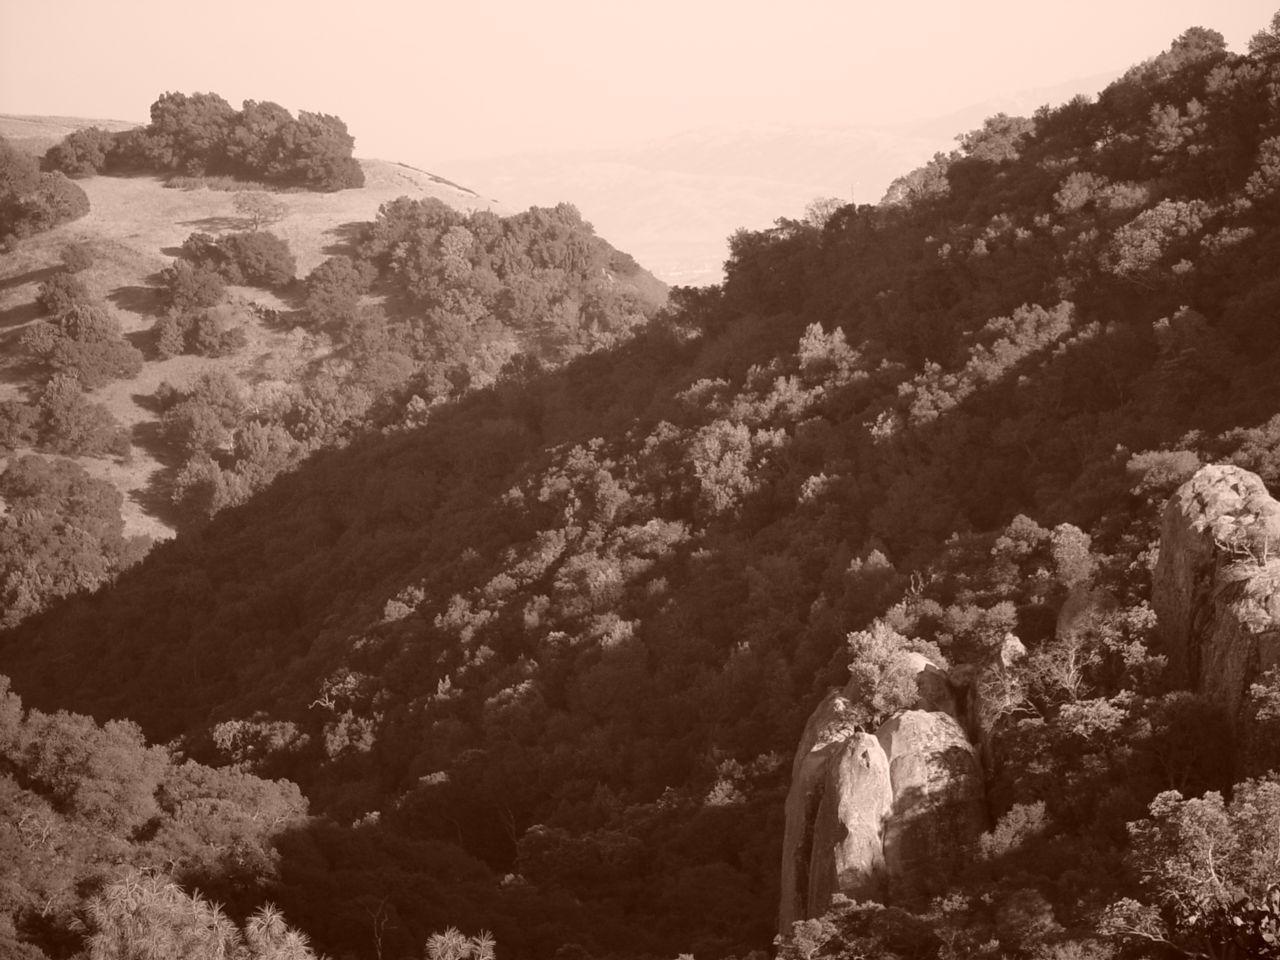 Mt. Diablo, California